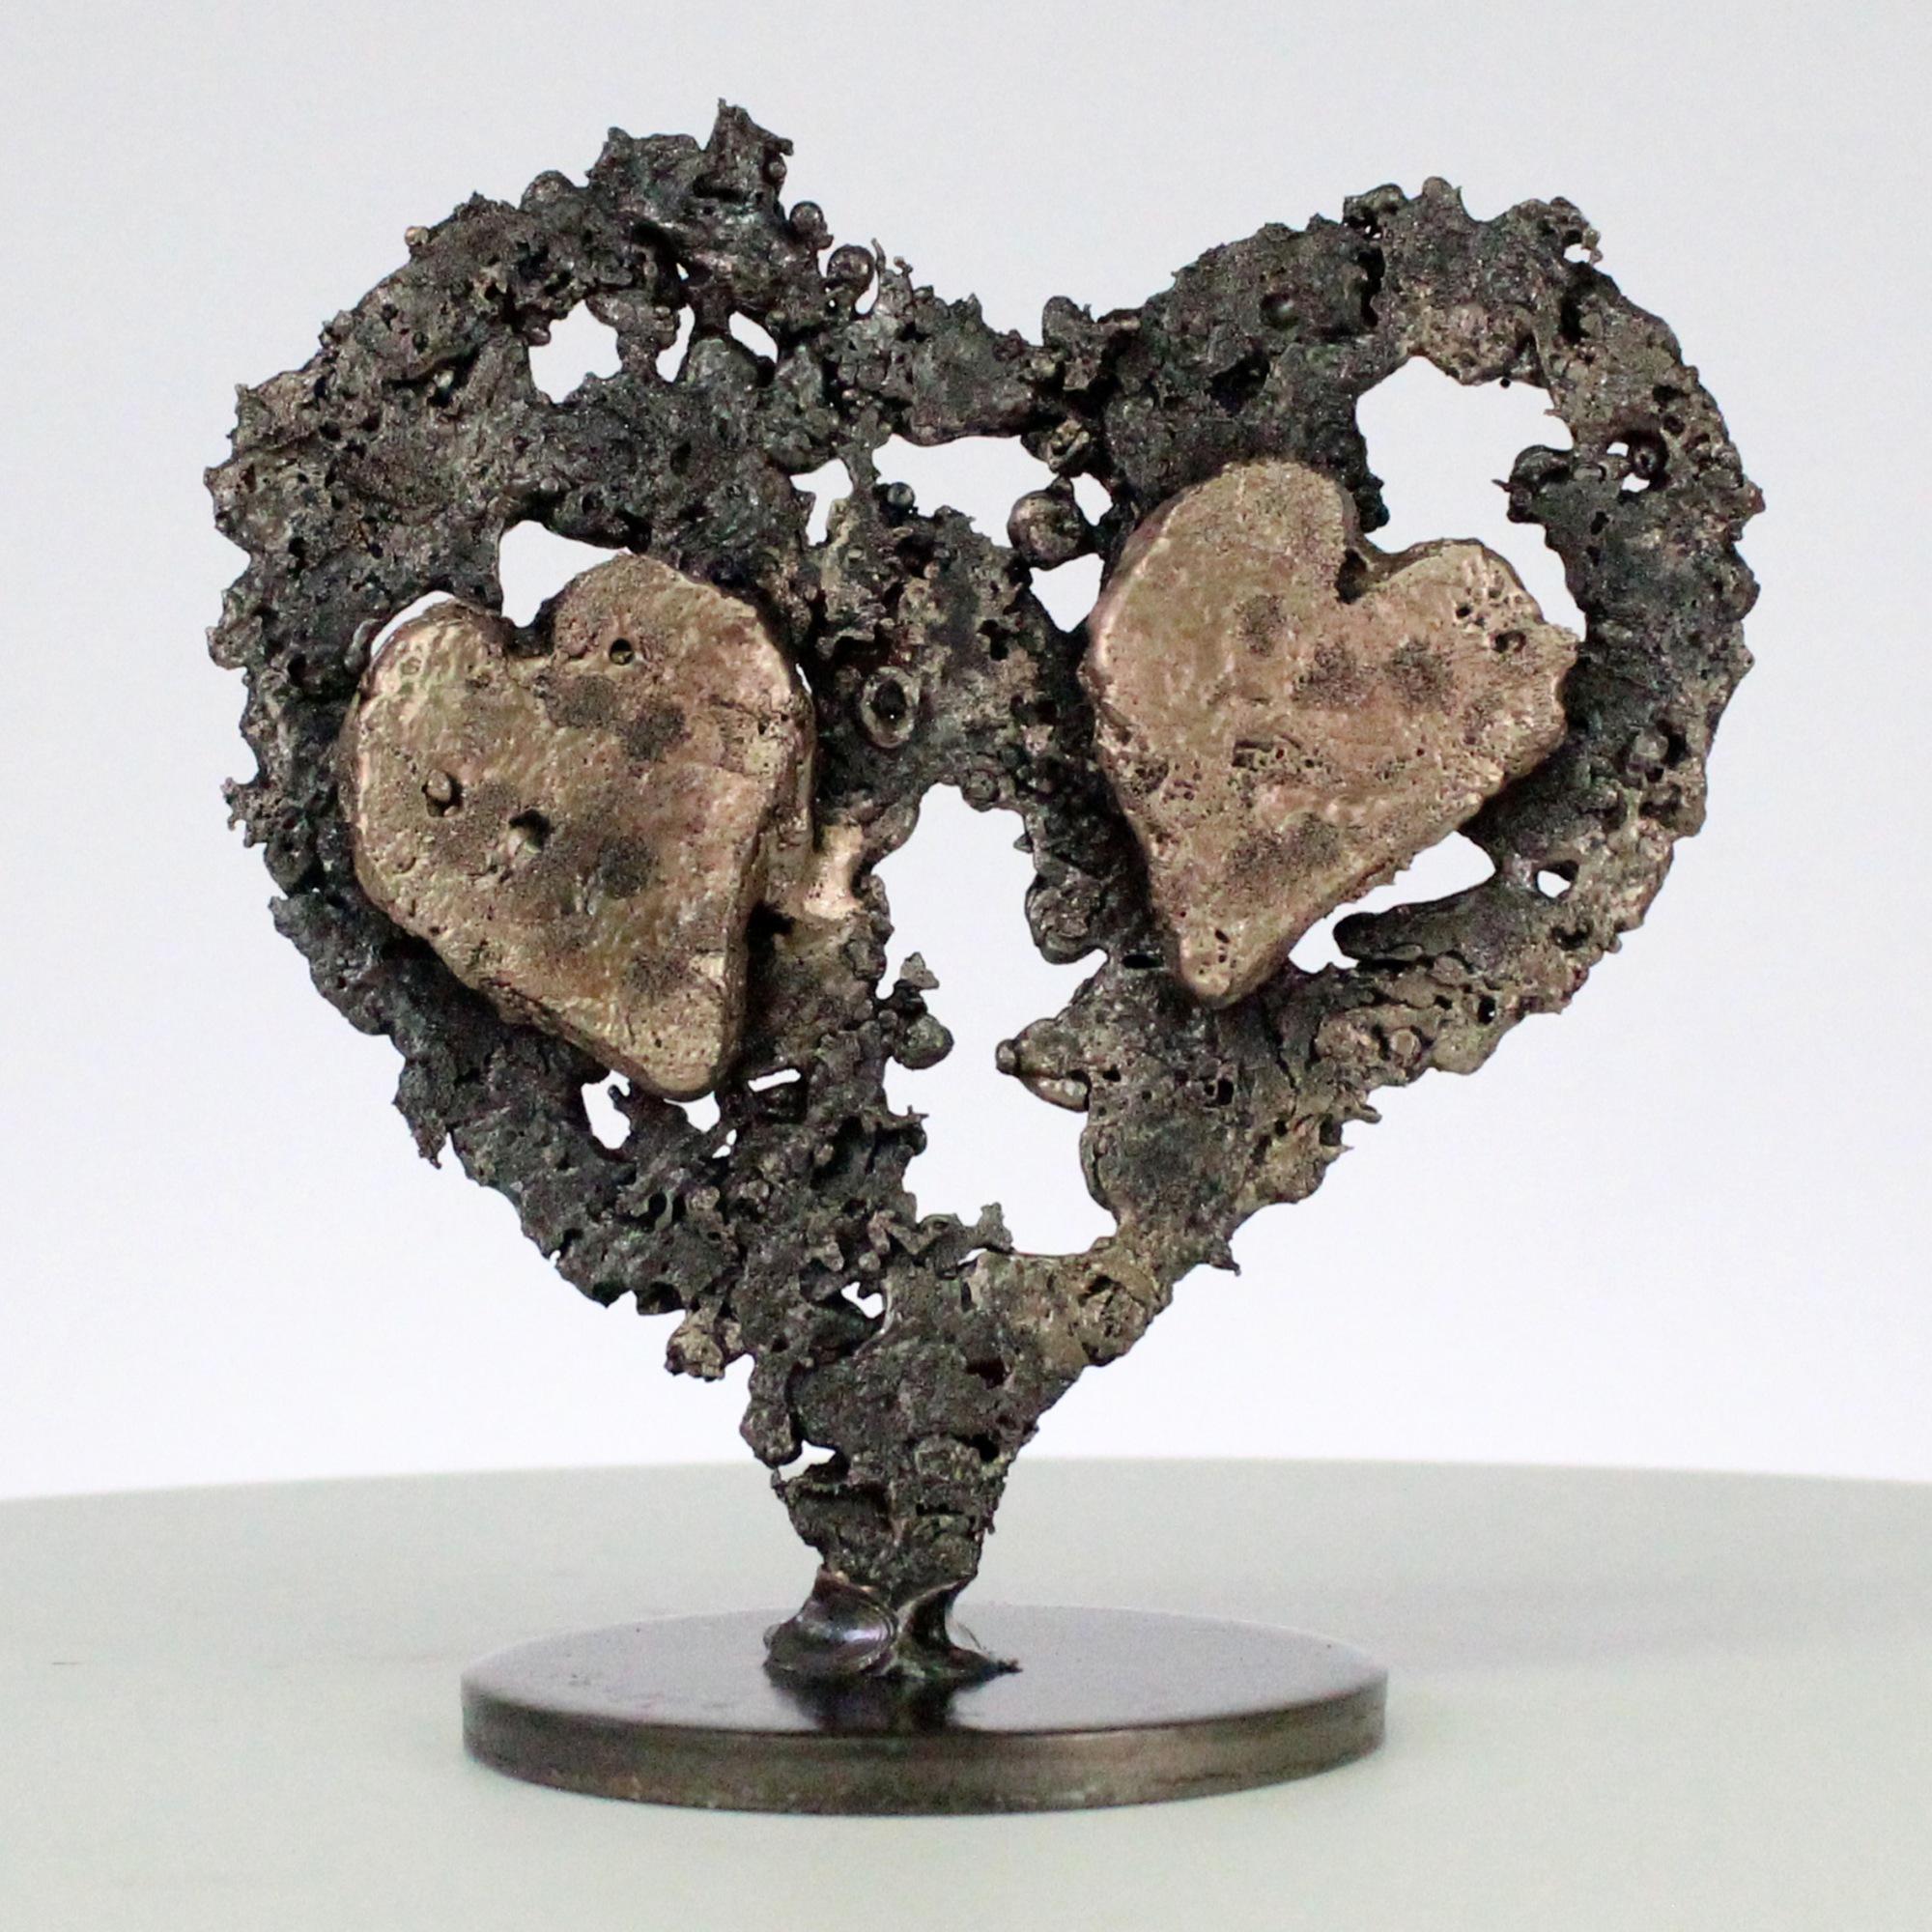 De coeurs sur coeur - Sculpture coeurs acier sur coeur métal bronze - Of hearts on heart - Sculpture steel hearts on bronze metal heart philippe Buil